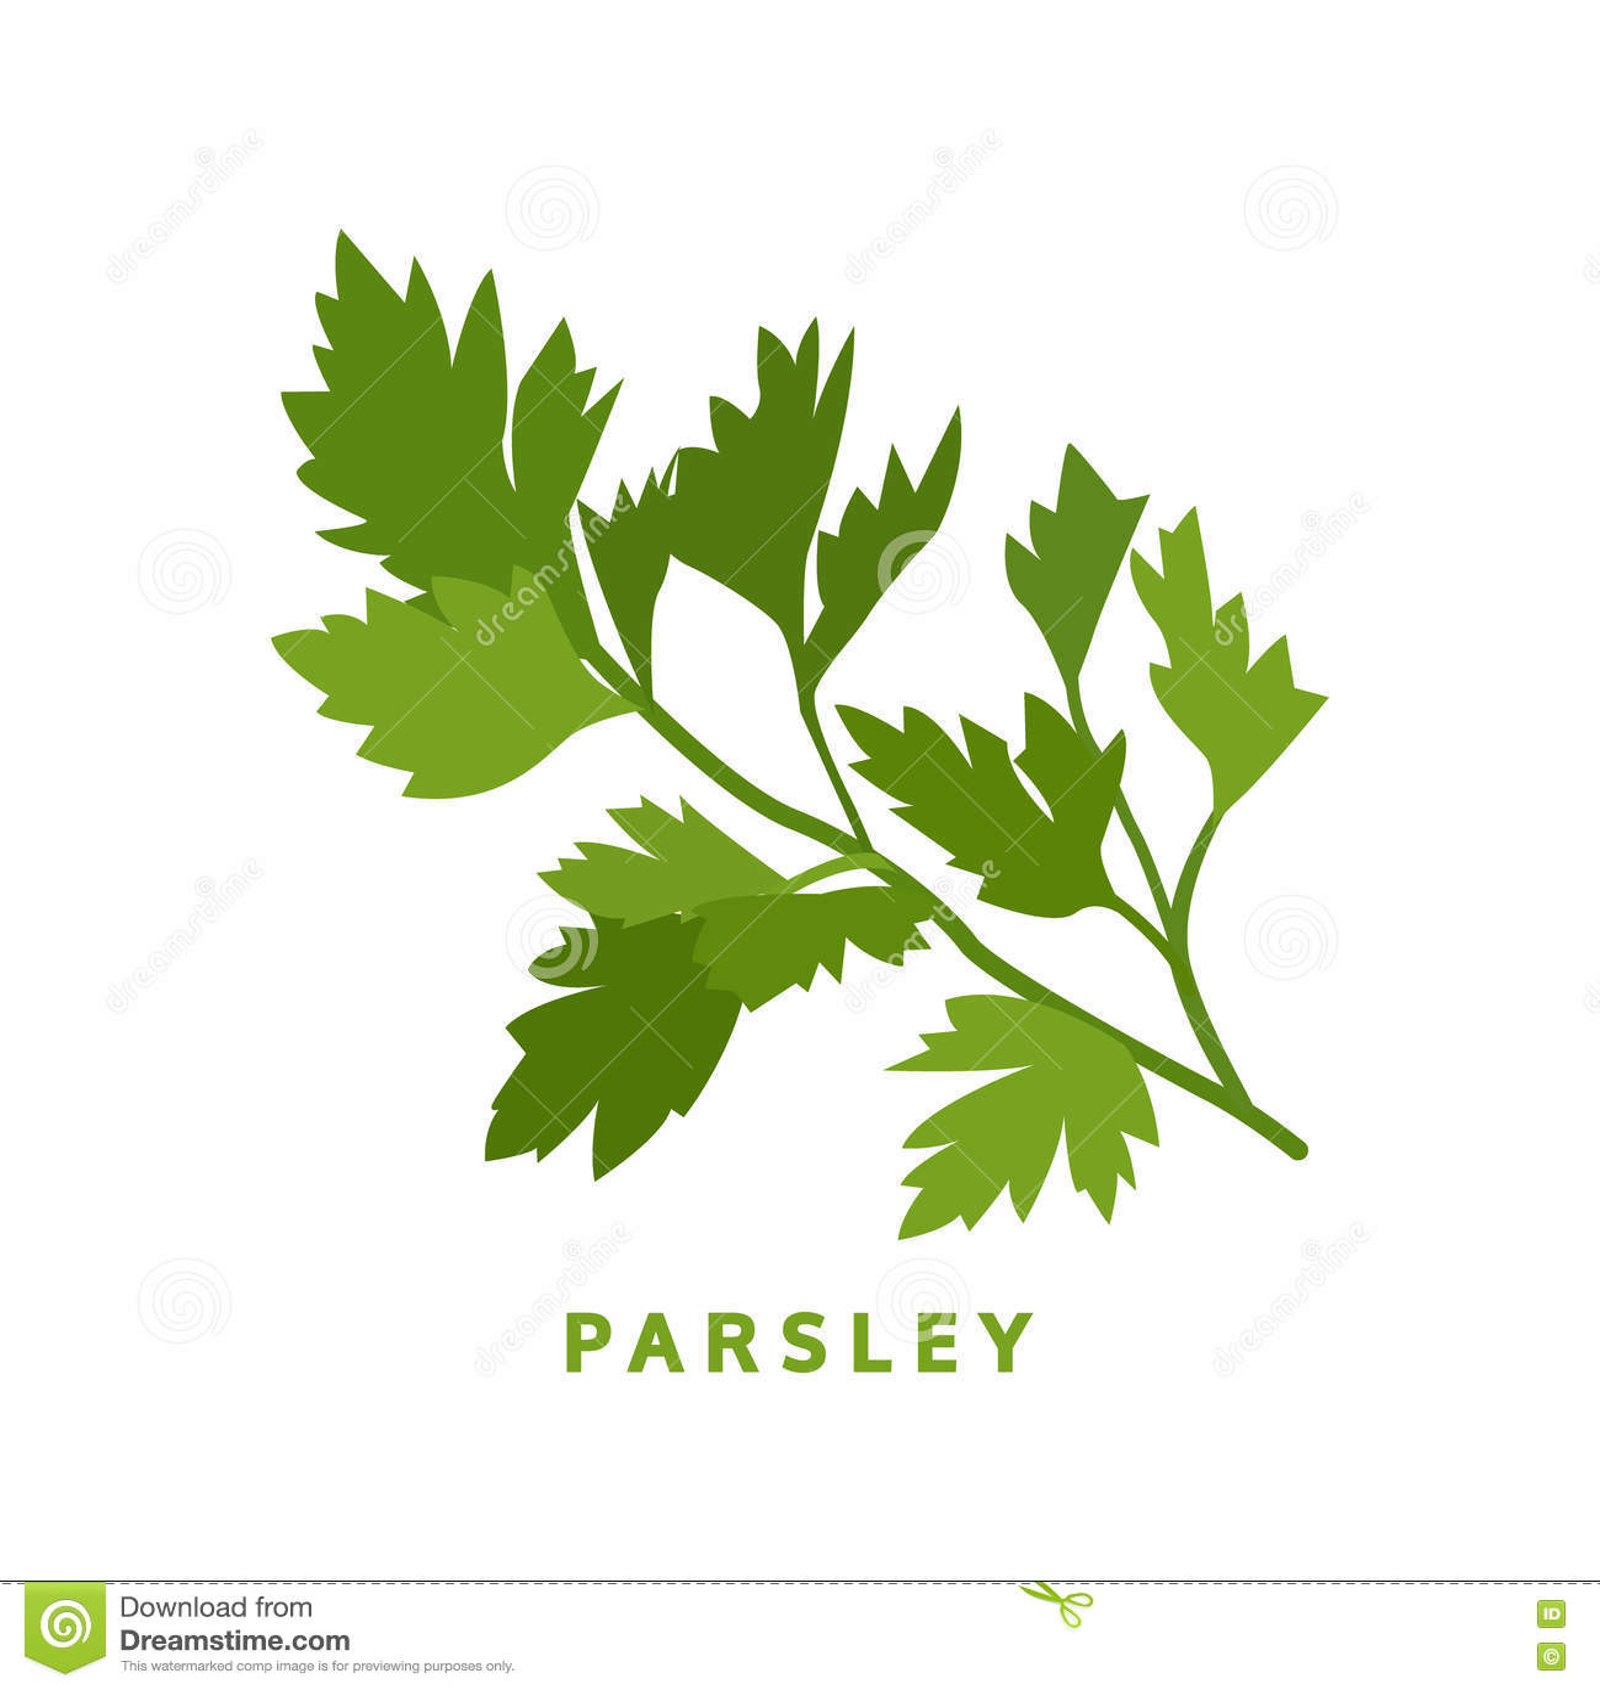 Parsley Illustration Parsley Herb, Food Vec...